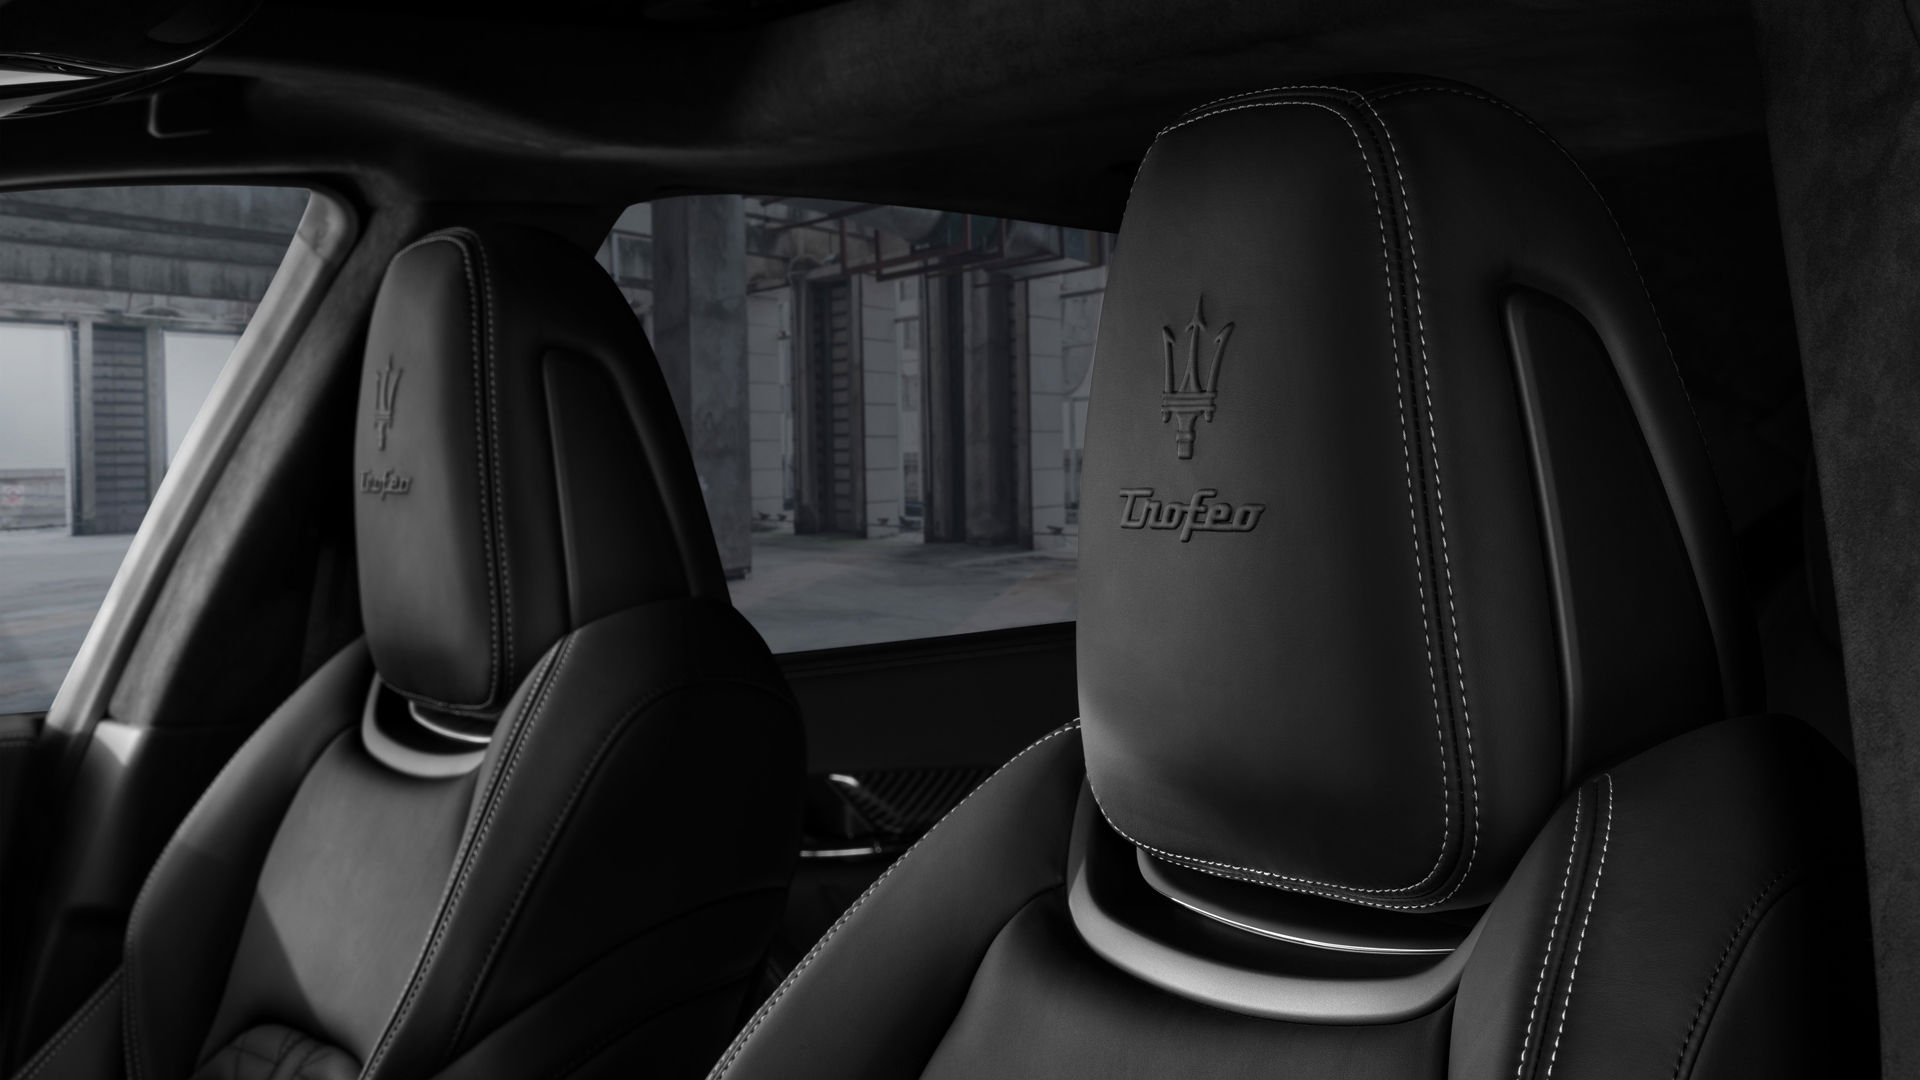 Maserati Quattroporte Trofeo - Komfort der Luxuslimousine